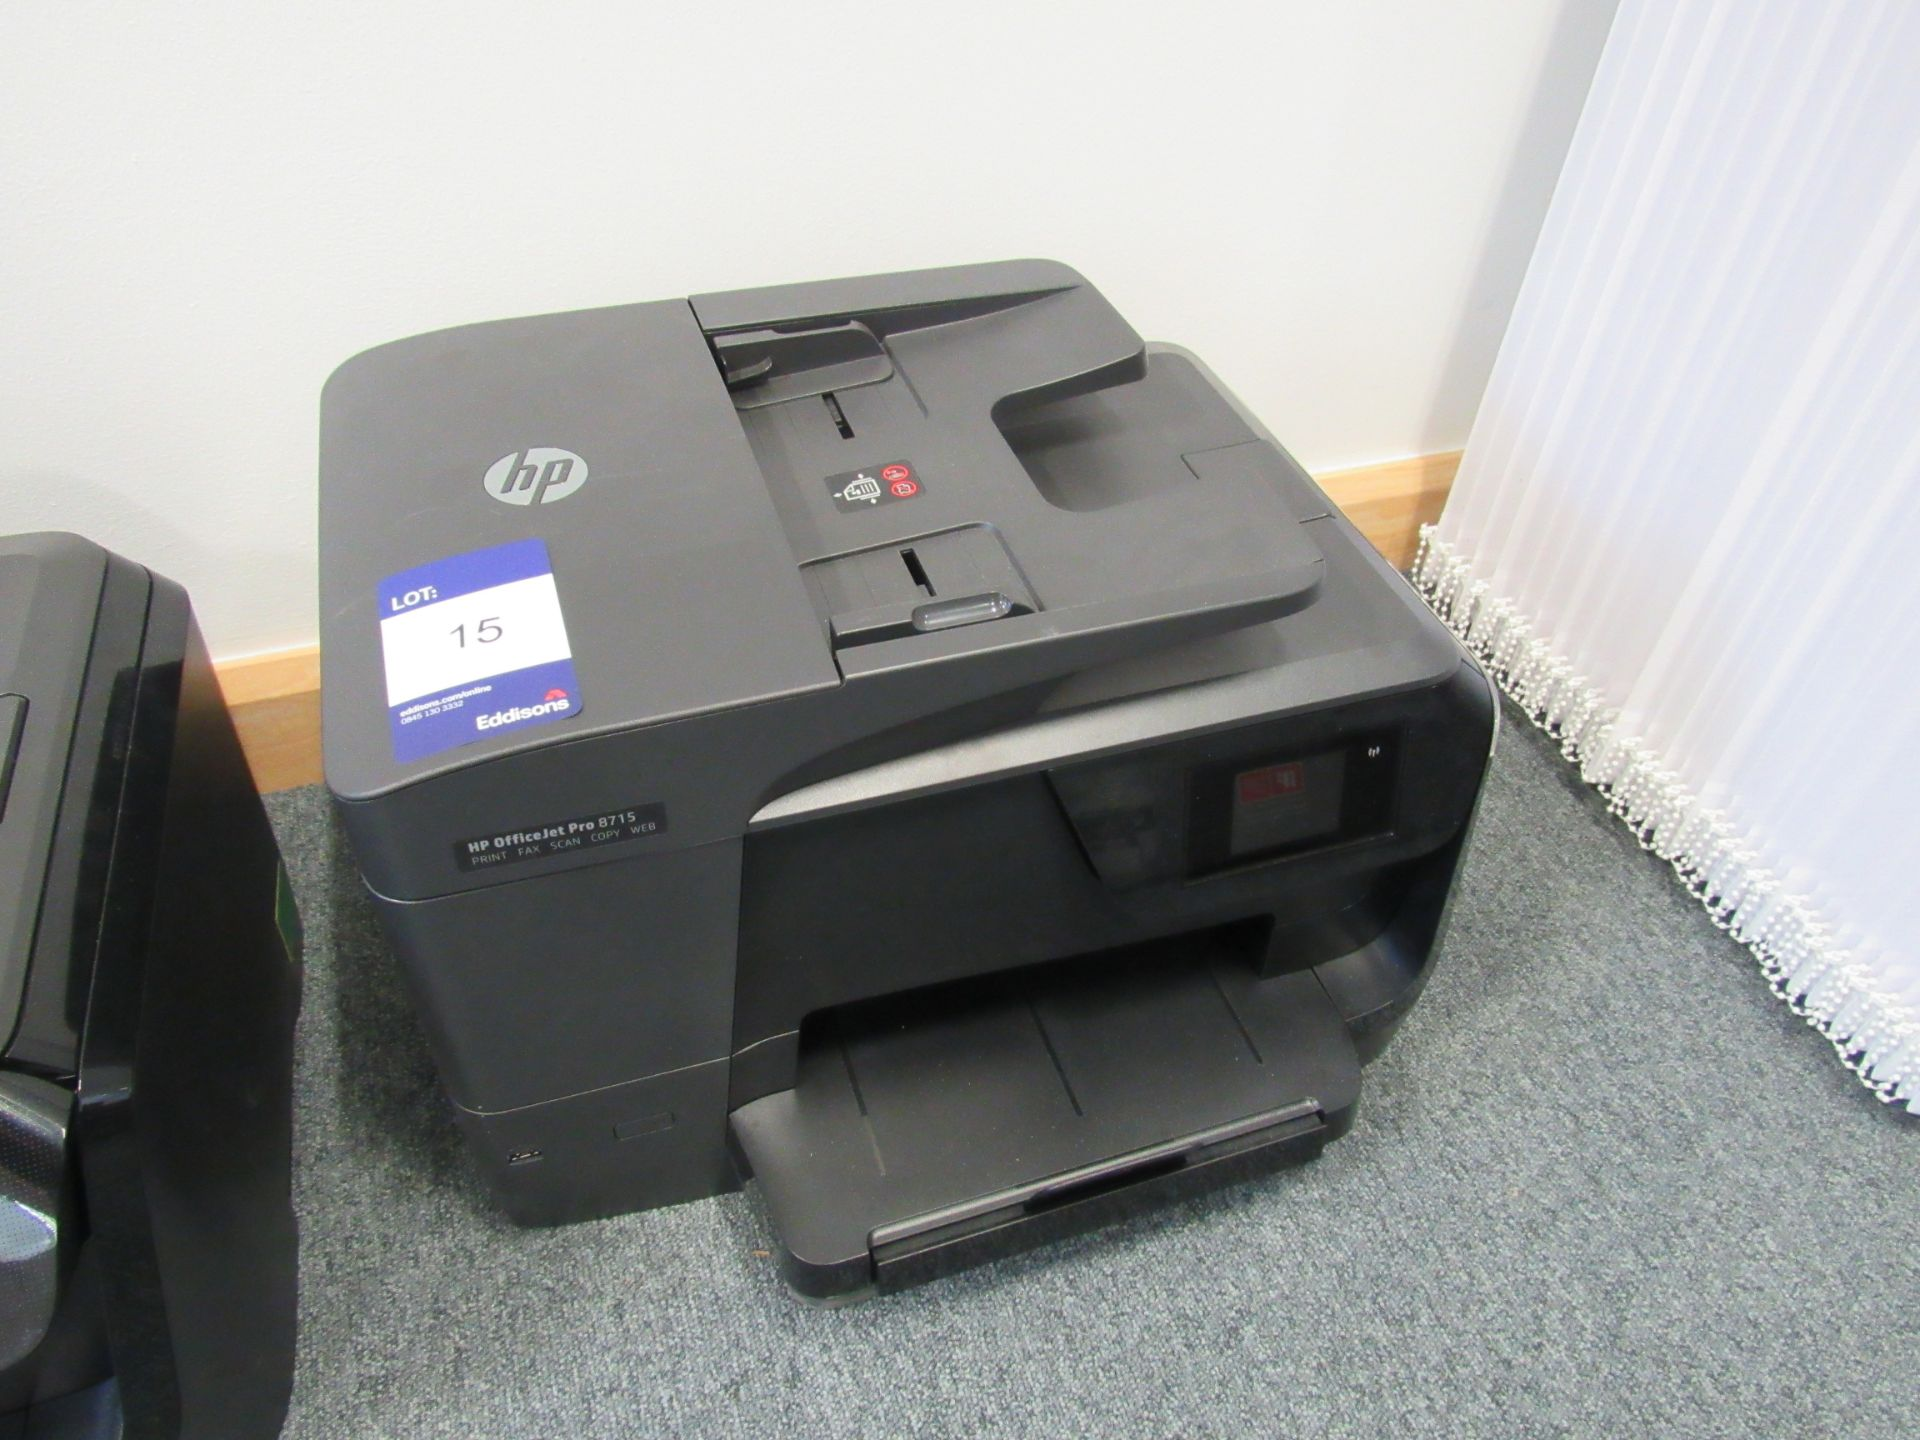 Lot 15 - HP Officejet Pro8715 All in One Printer/Fax/Scan/Copier